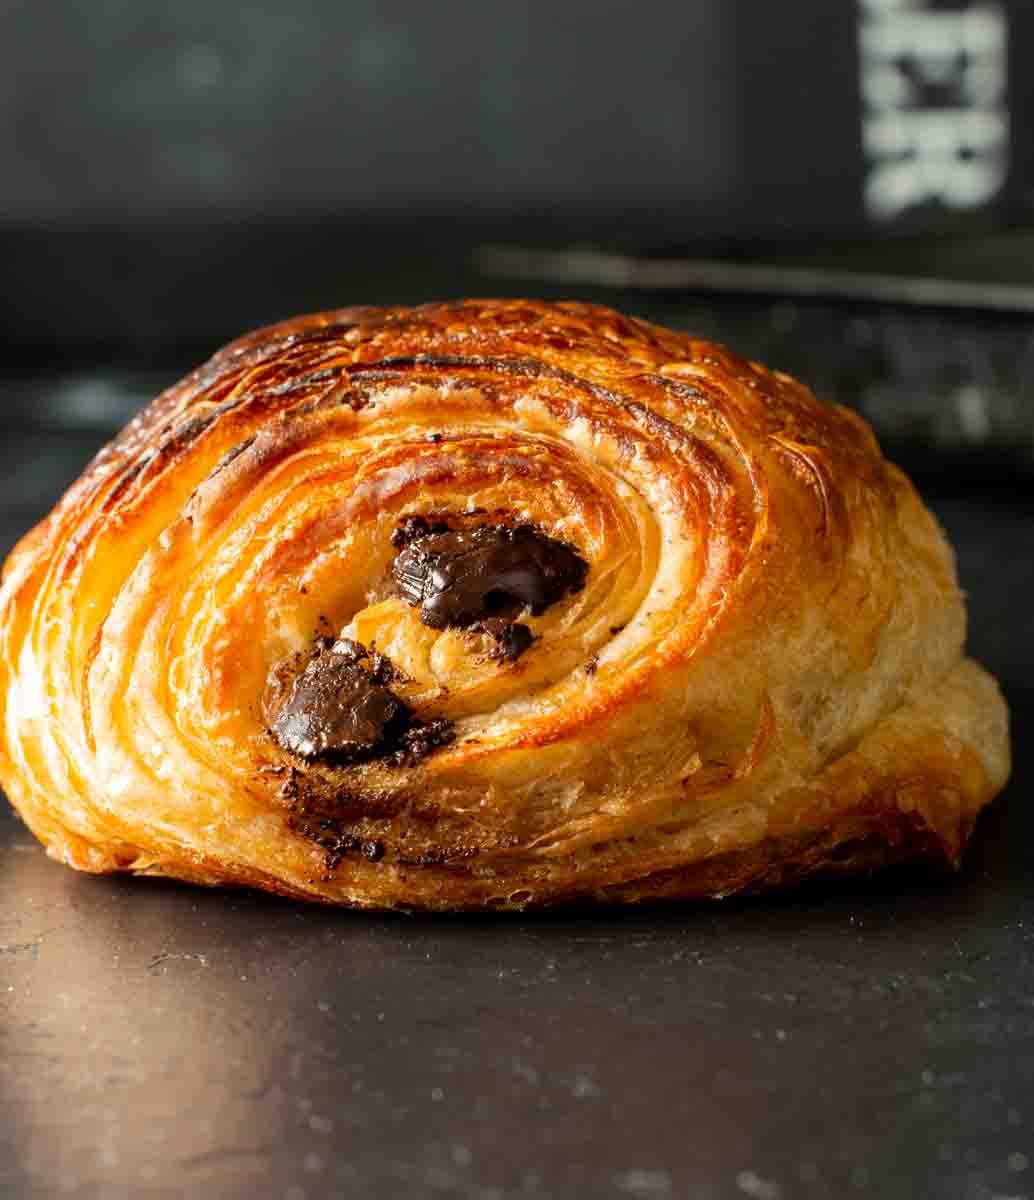 image: pain au chocolate